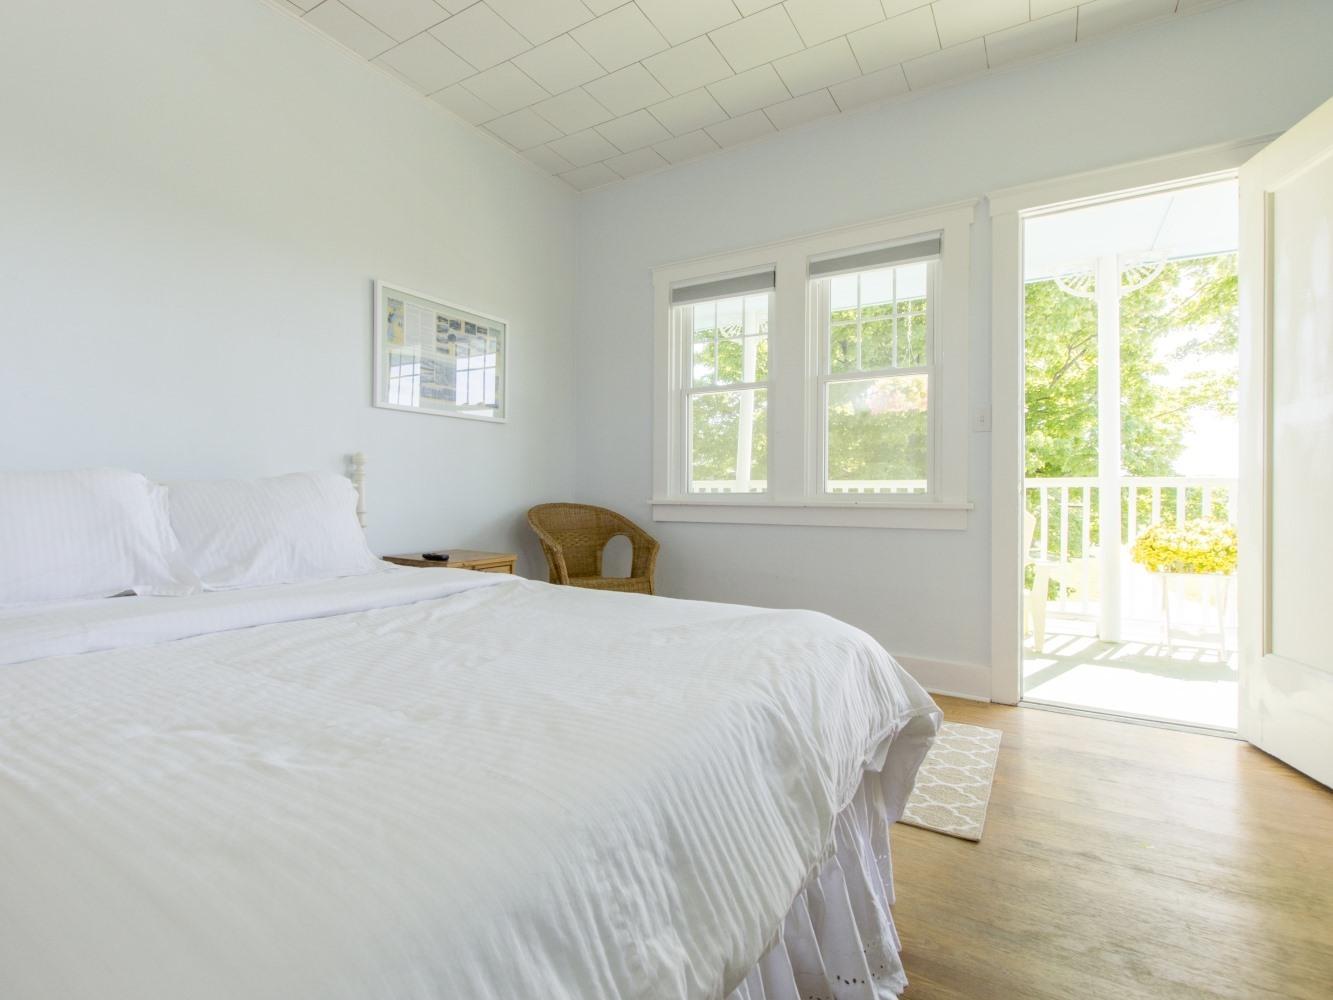 Beach House 1st Floor-Single room-Private Bathroom-Standard